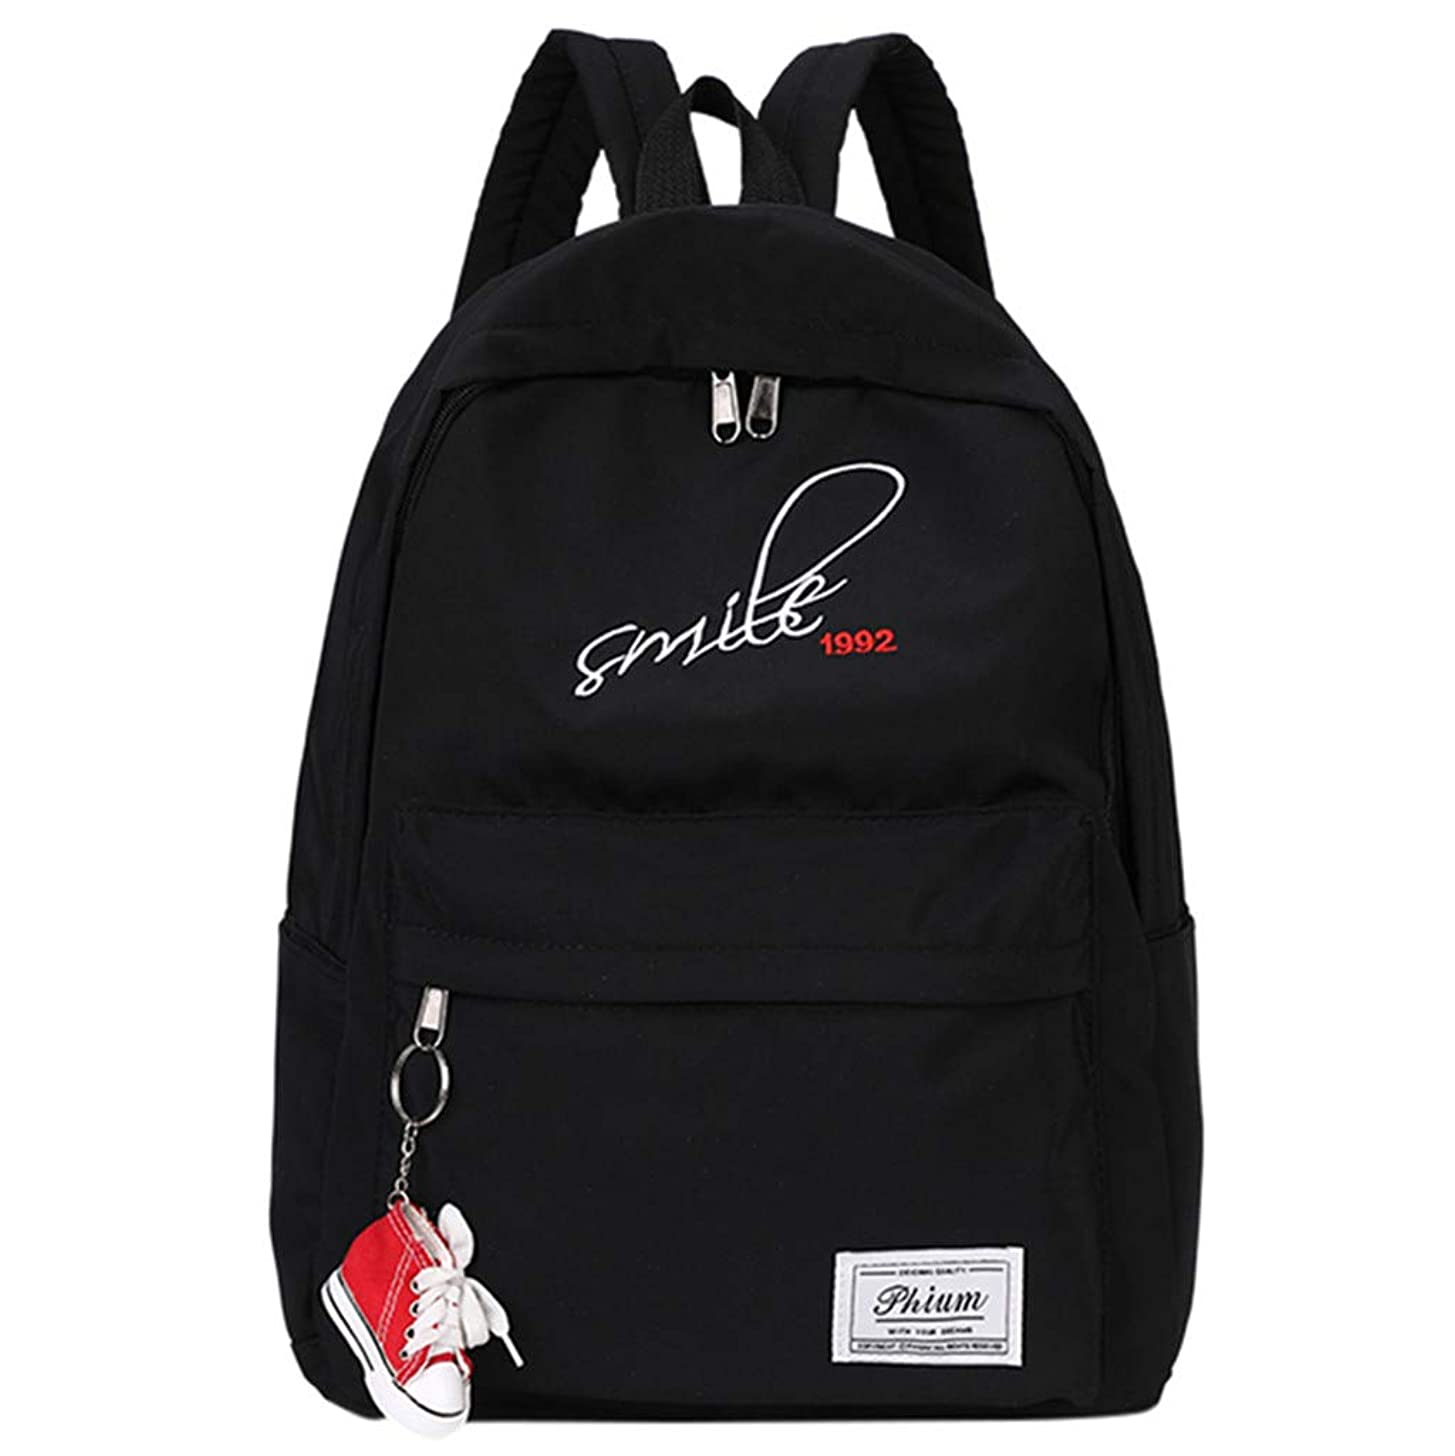 Tronet Women Fashion Backpack,New Men and Women Student Bag Korean Travel Backpack Wild Waterproof Backpack